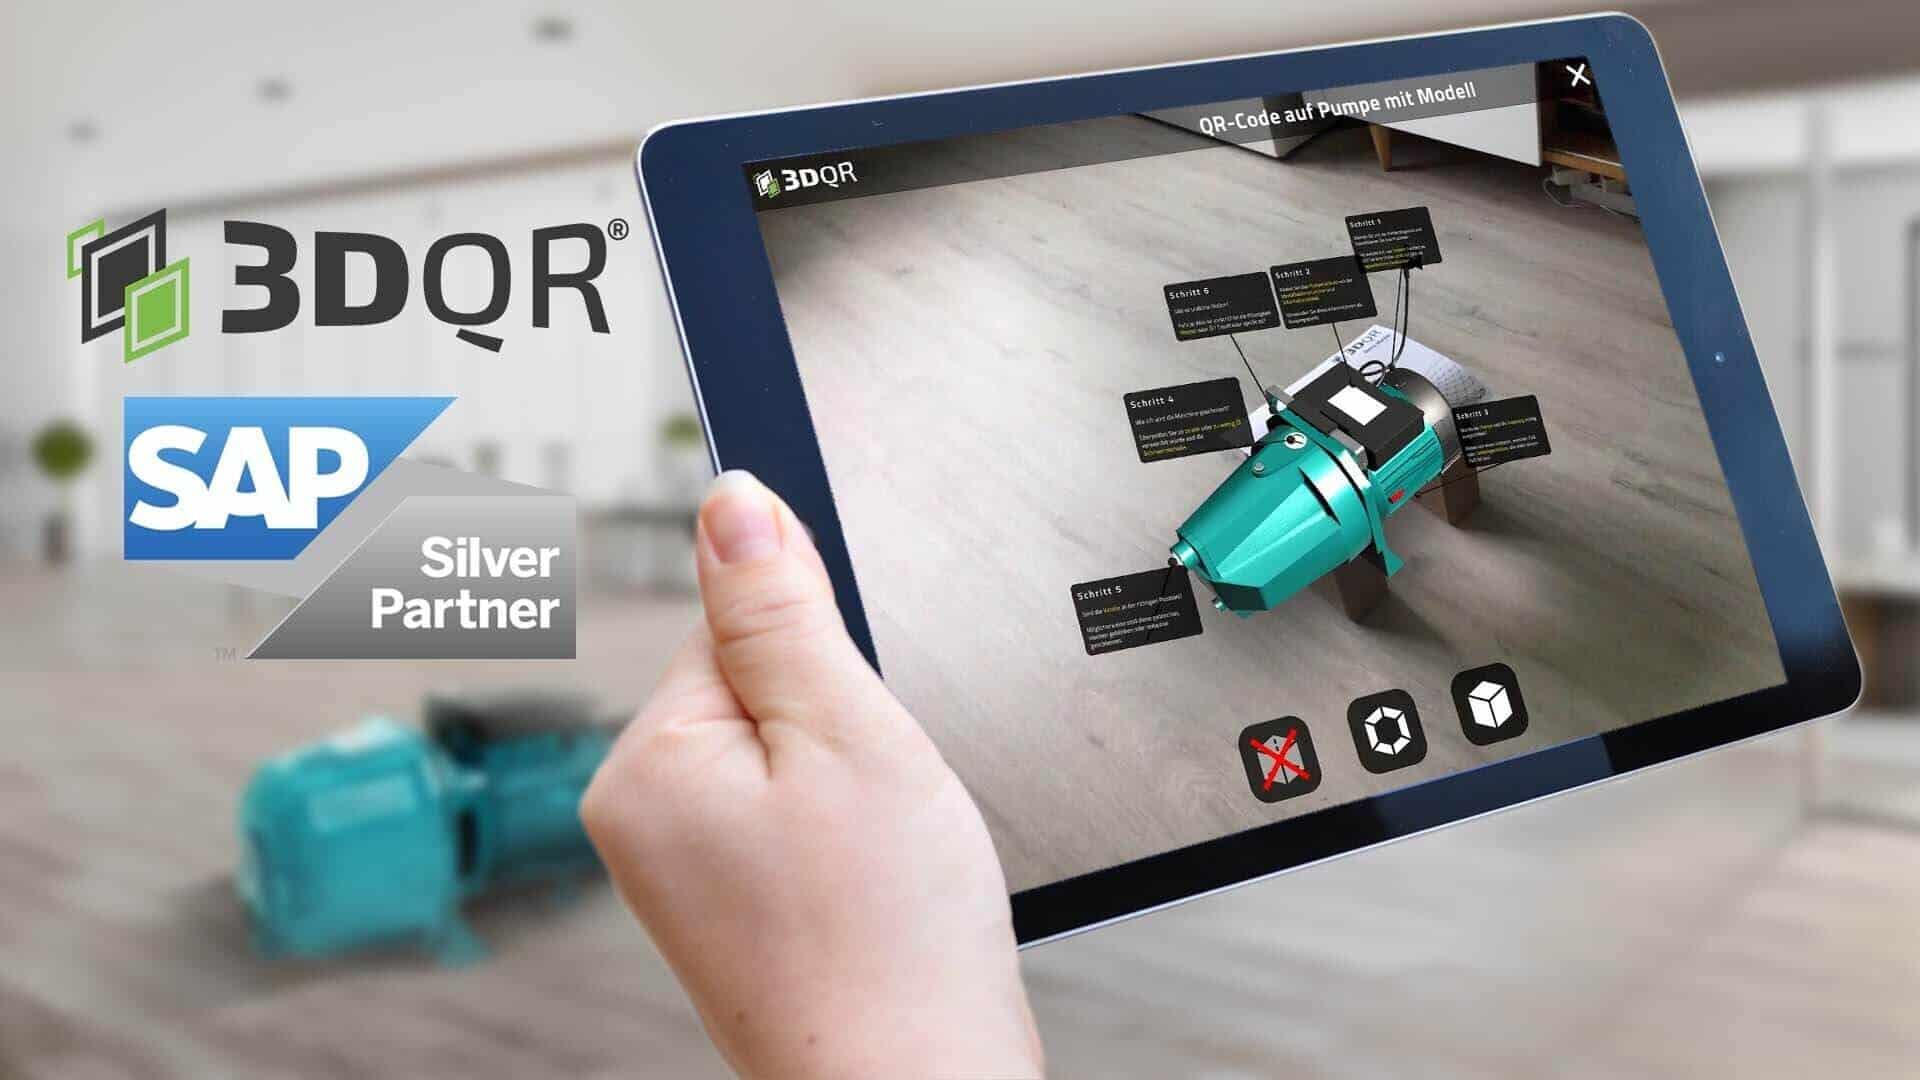 3DQR SAP Silver Partner